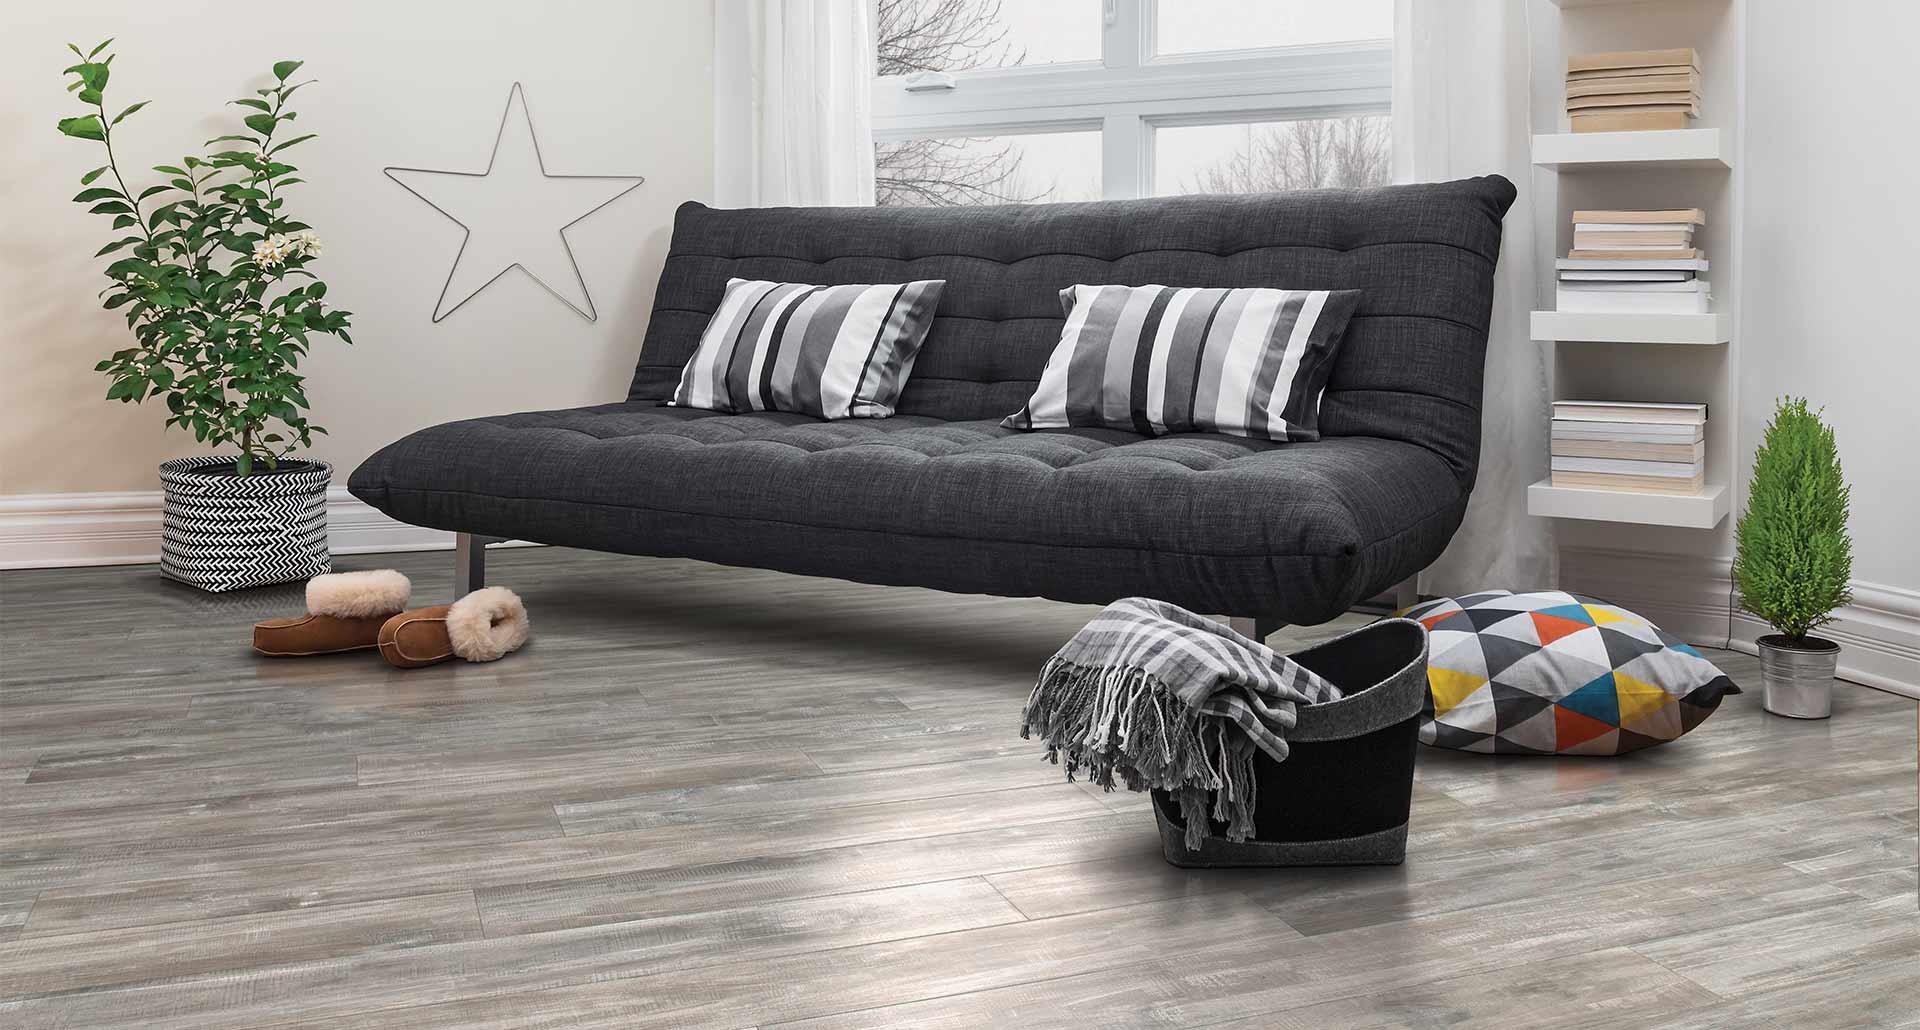 Benefits of walnut laminate flooring